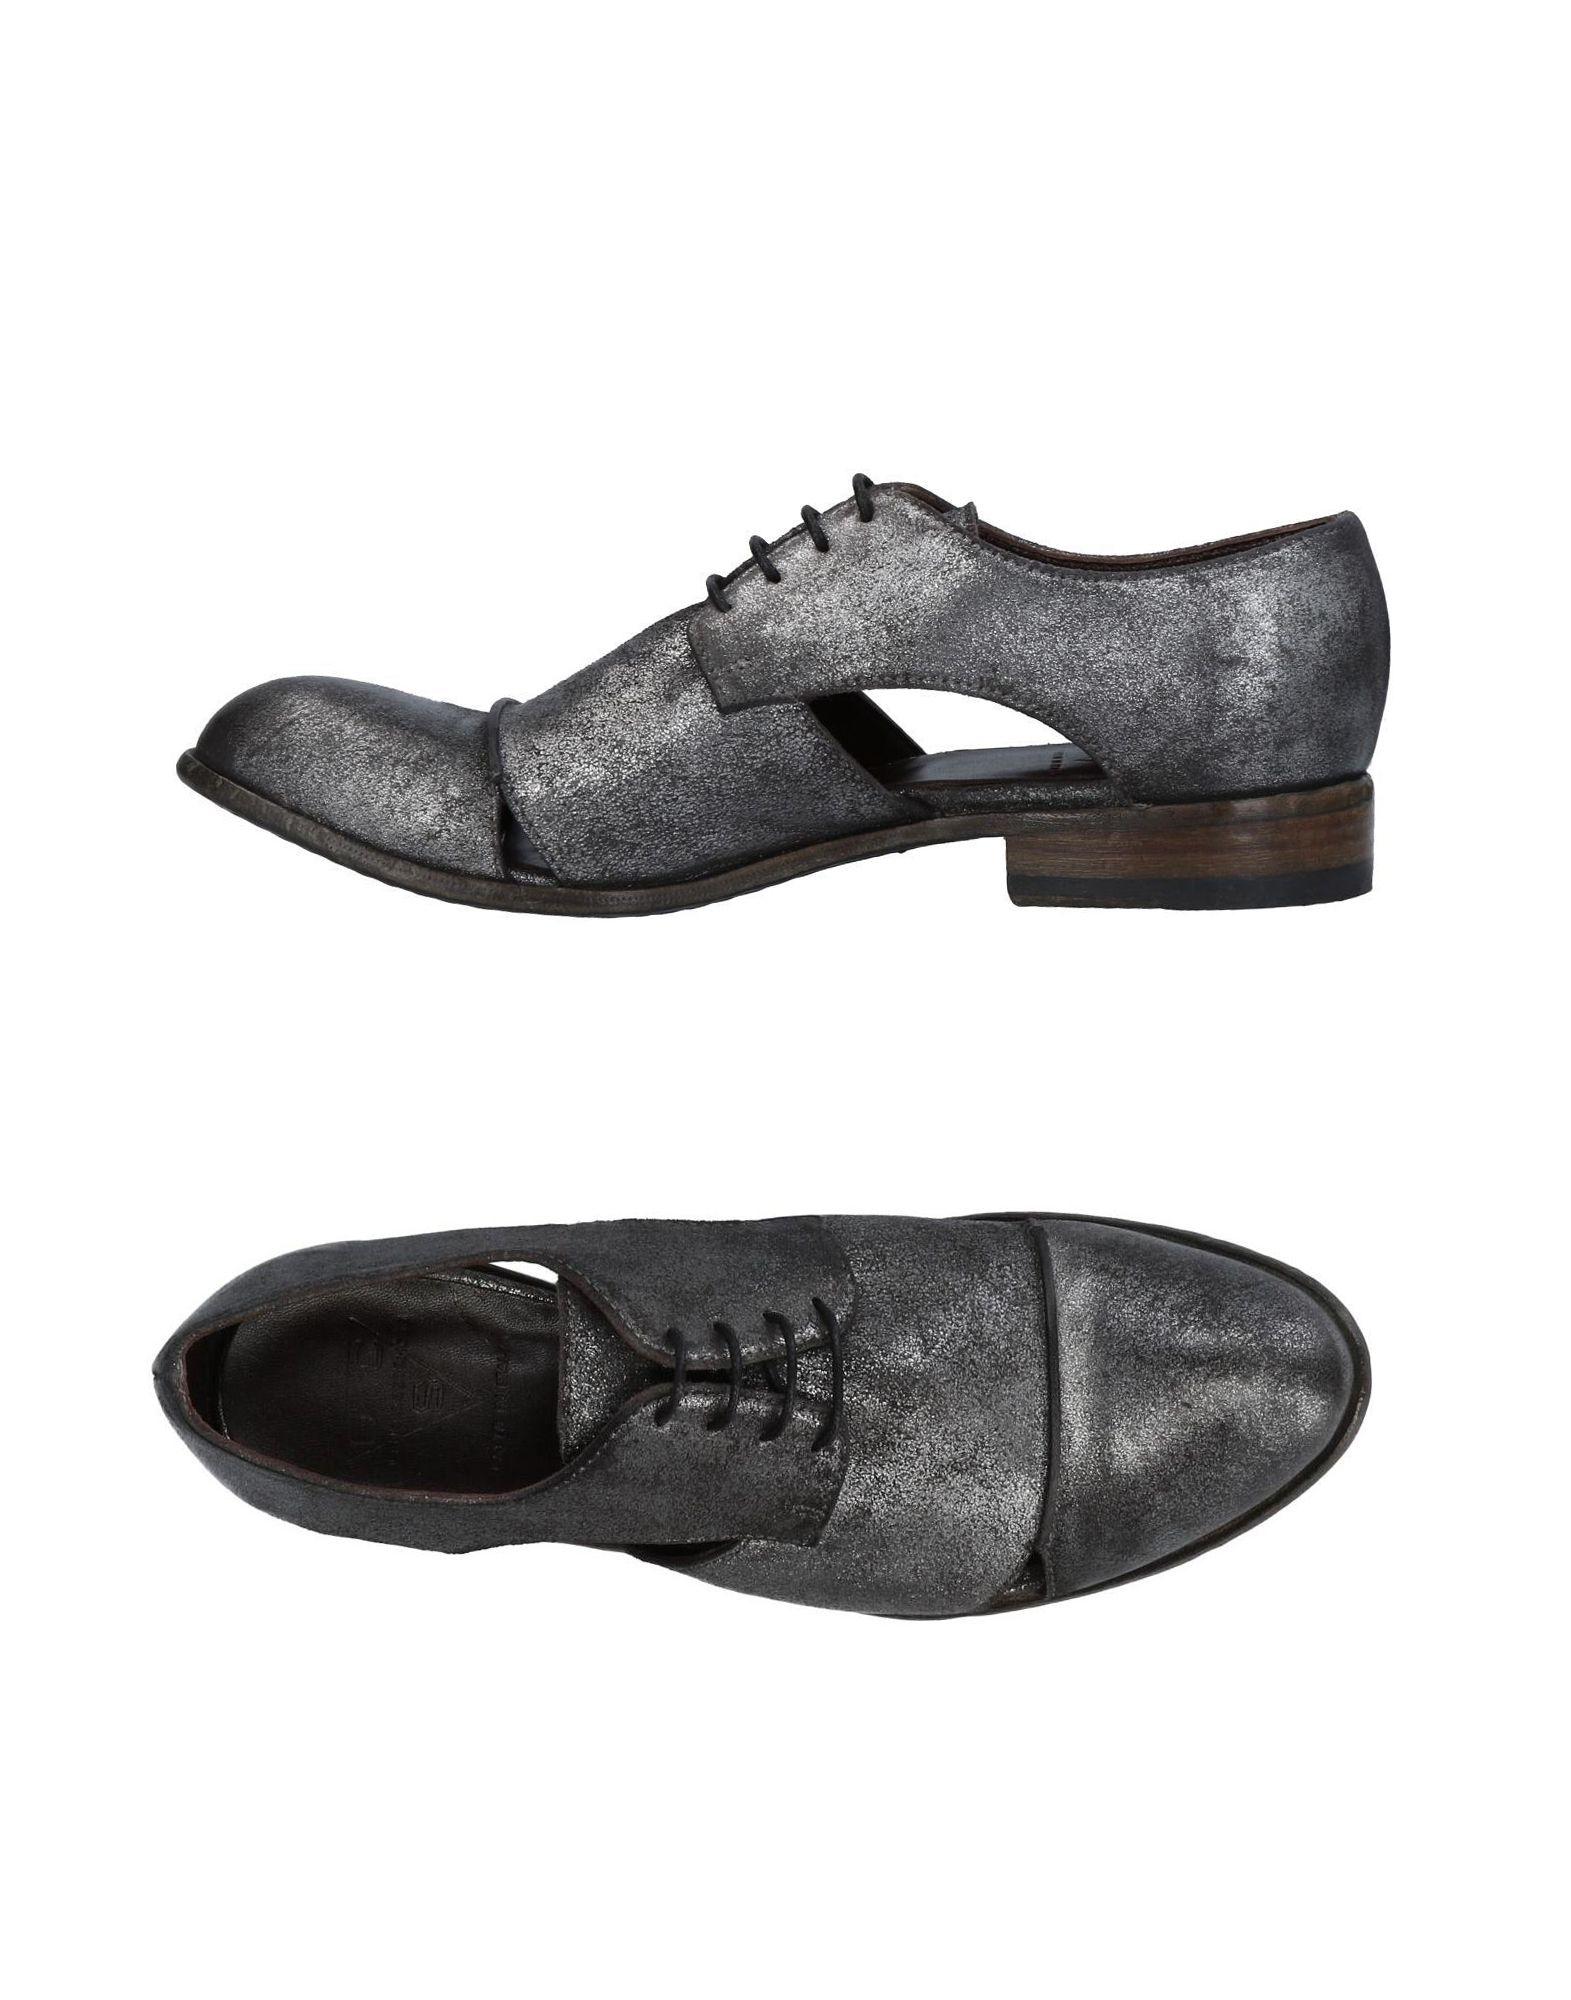 OPEN CLOSED SHOES Обувь на шнурках alpe woman shoes обувь на шнурках